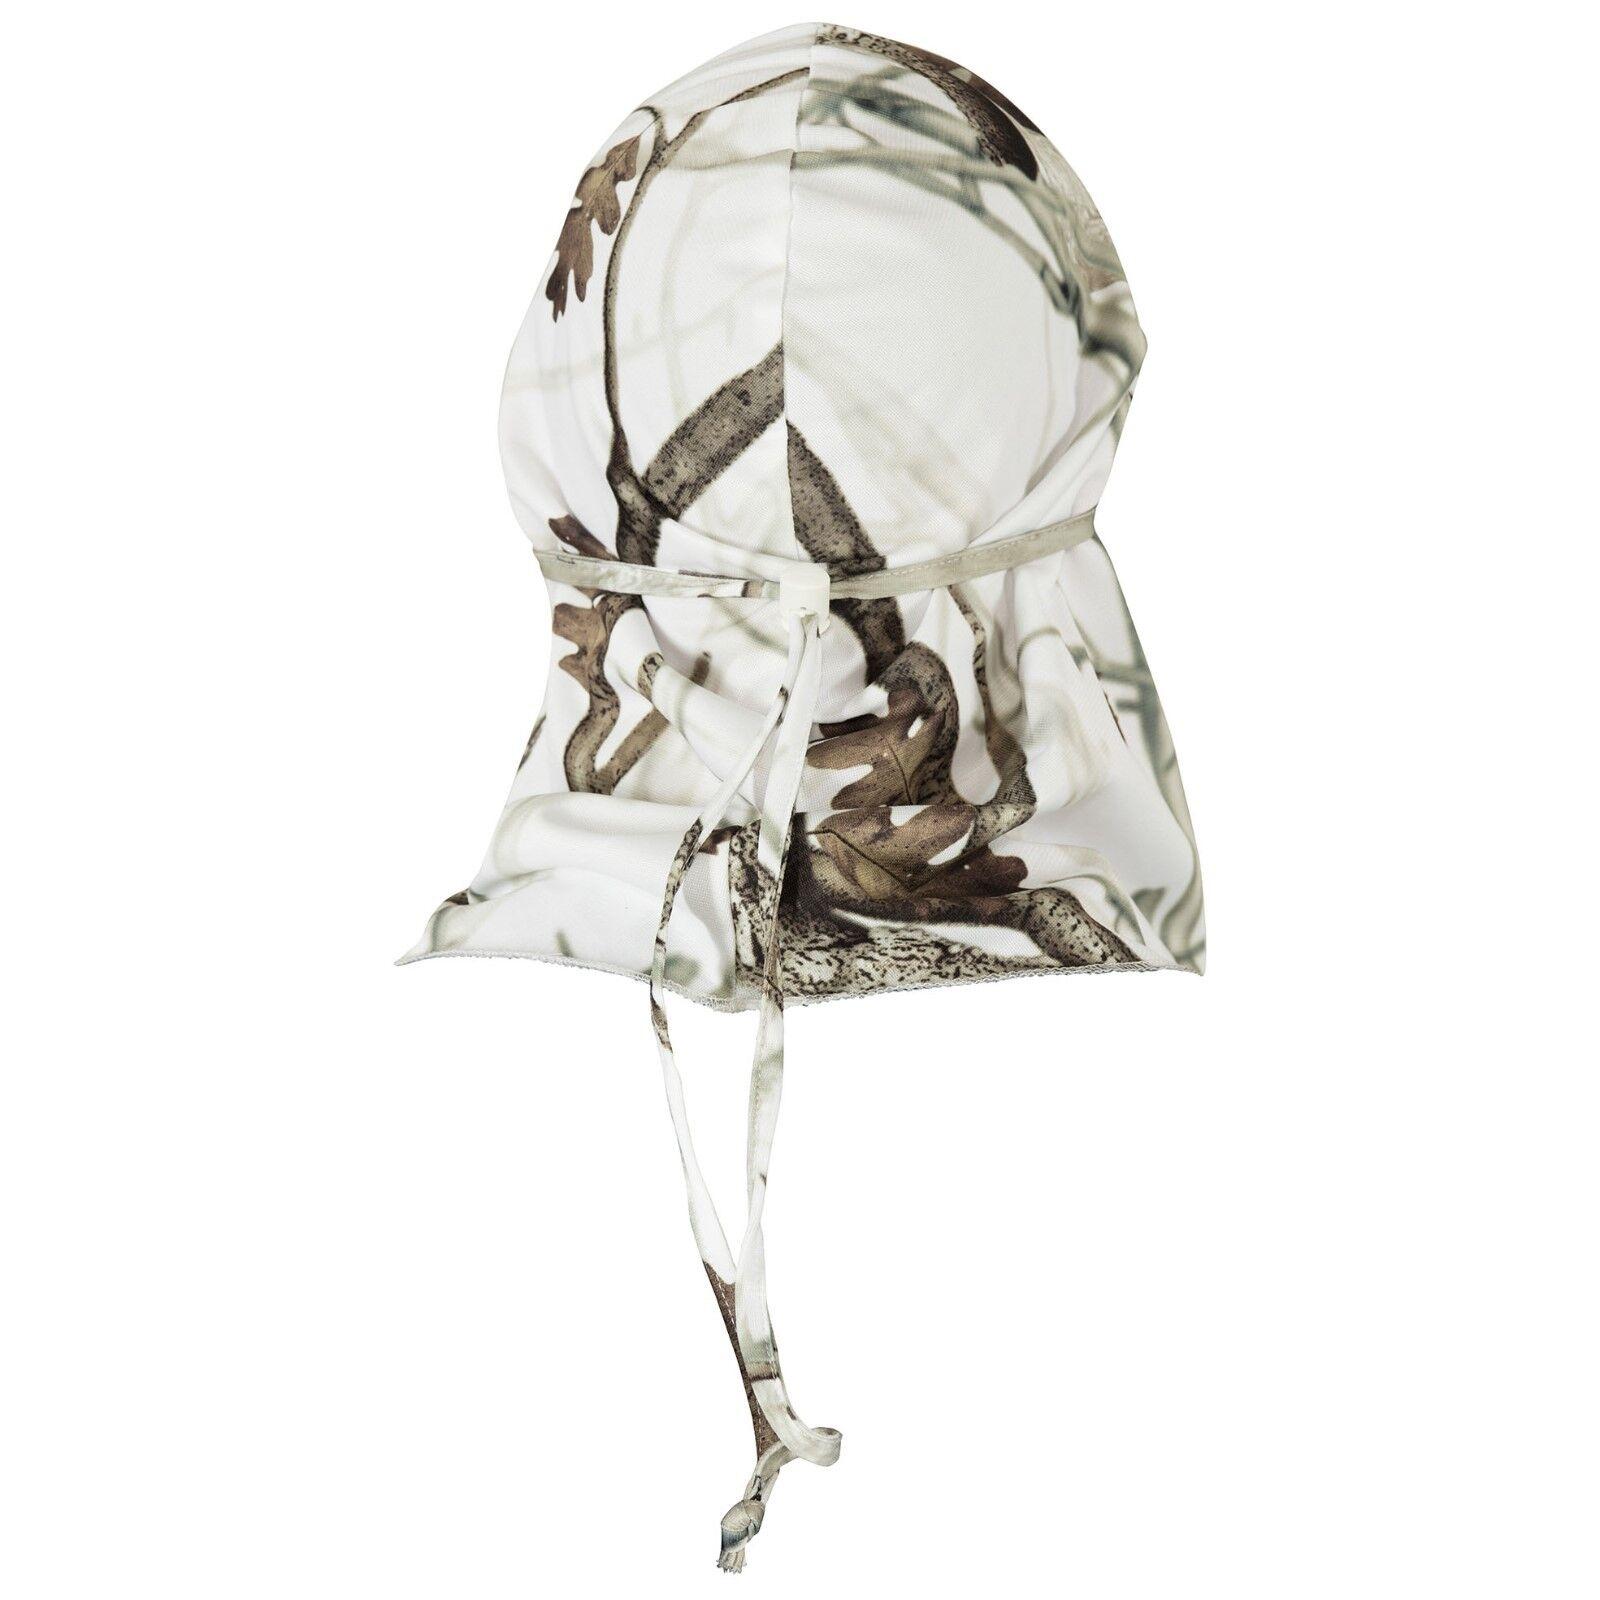 Schneetarnanzug SNOW Jacke Jacke Jacke Hose Maske 47-Innovation Snow Camo Deerhunter 2118 2c43a2